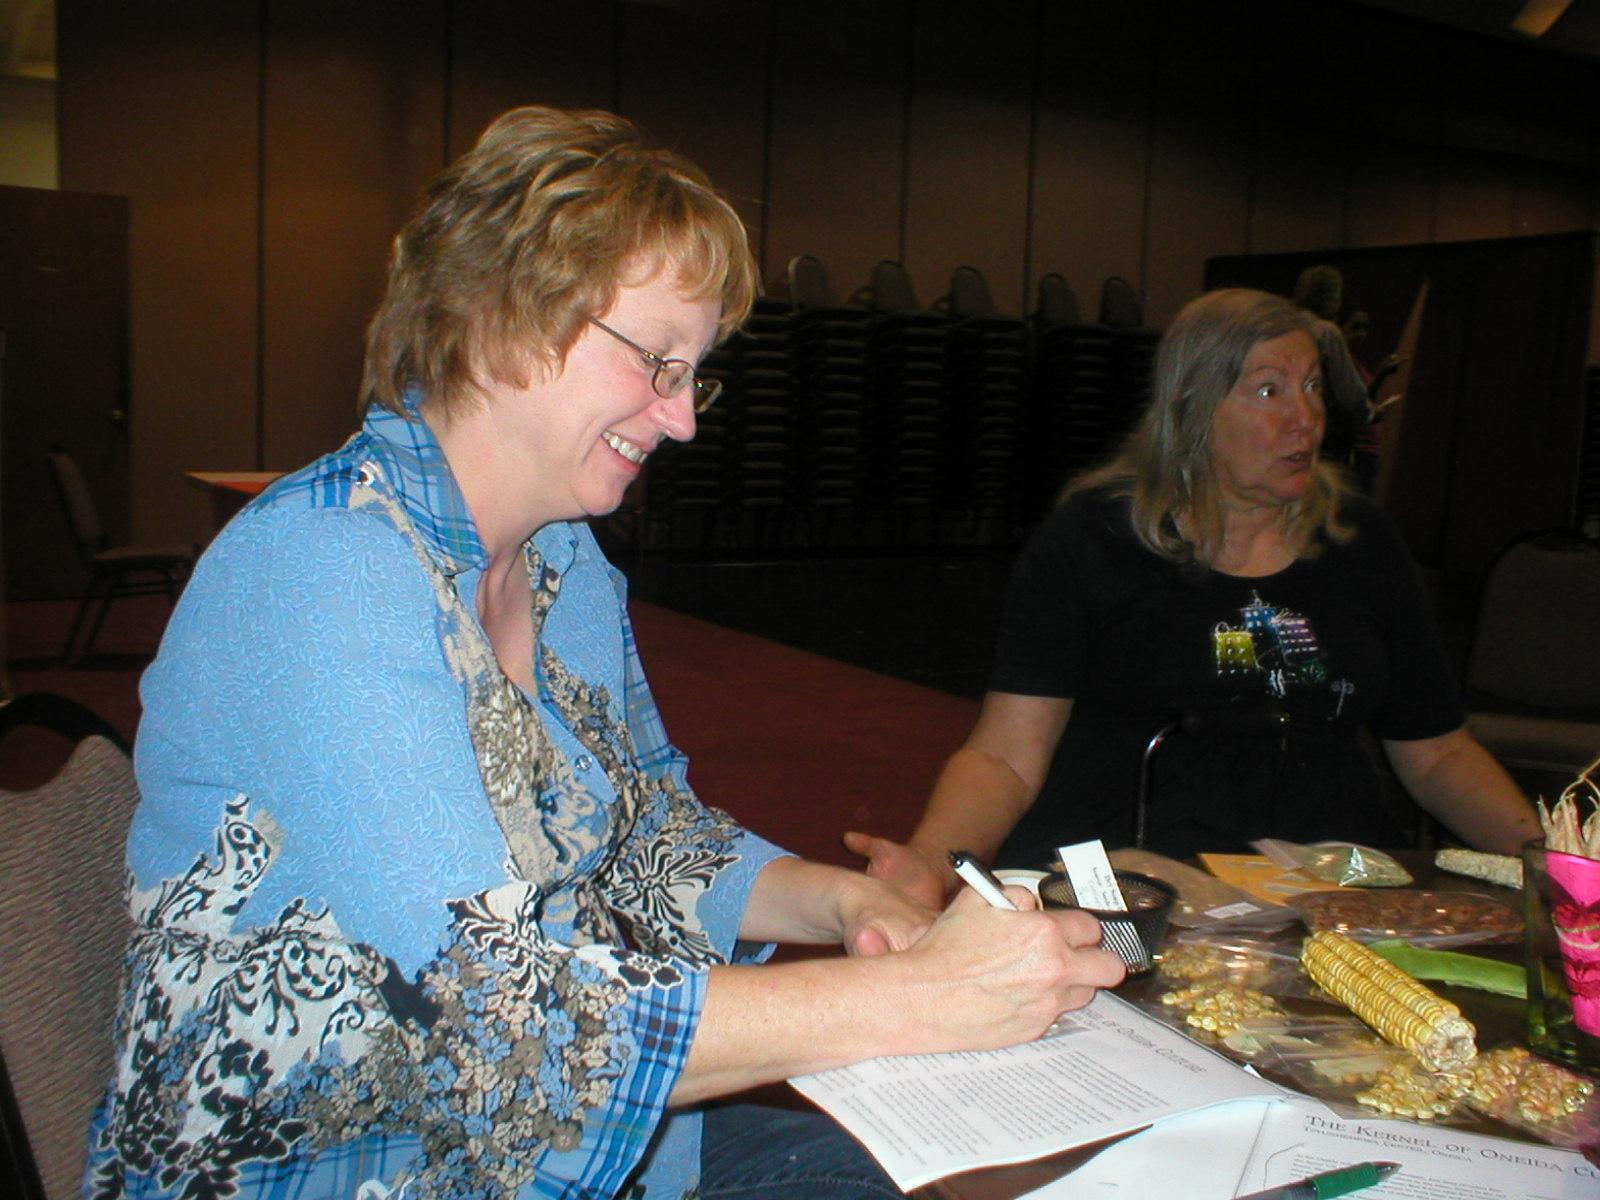 Sandy Stein saving seed